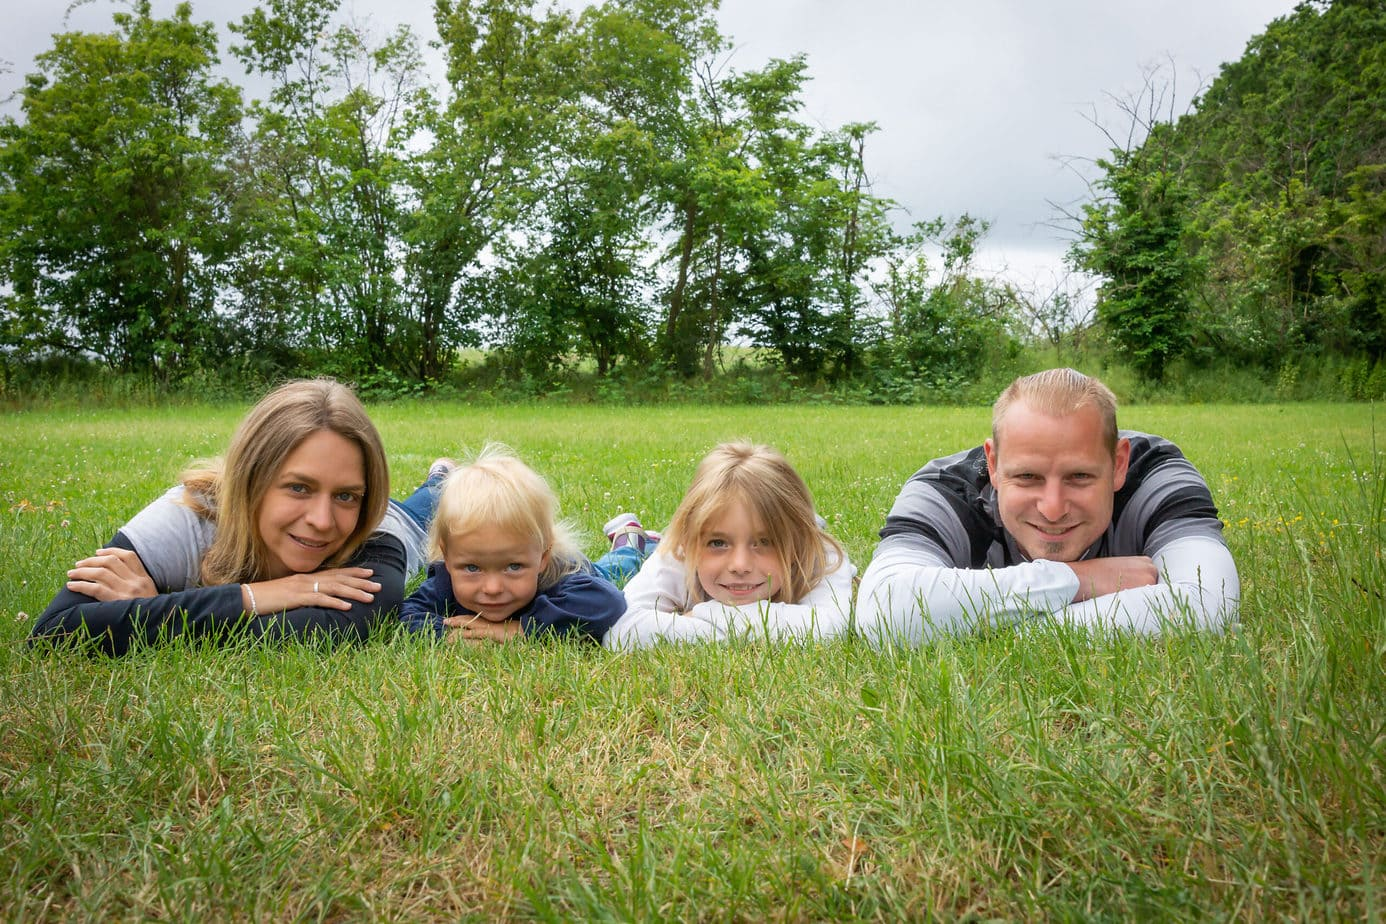 Familienaufnahmen in der Natur